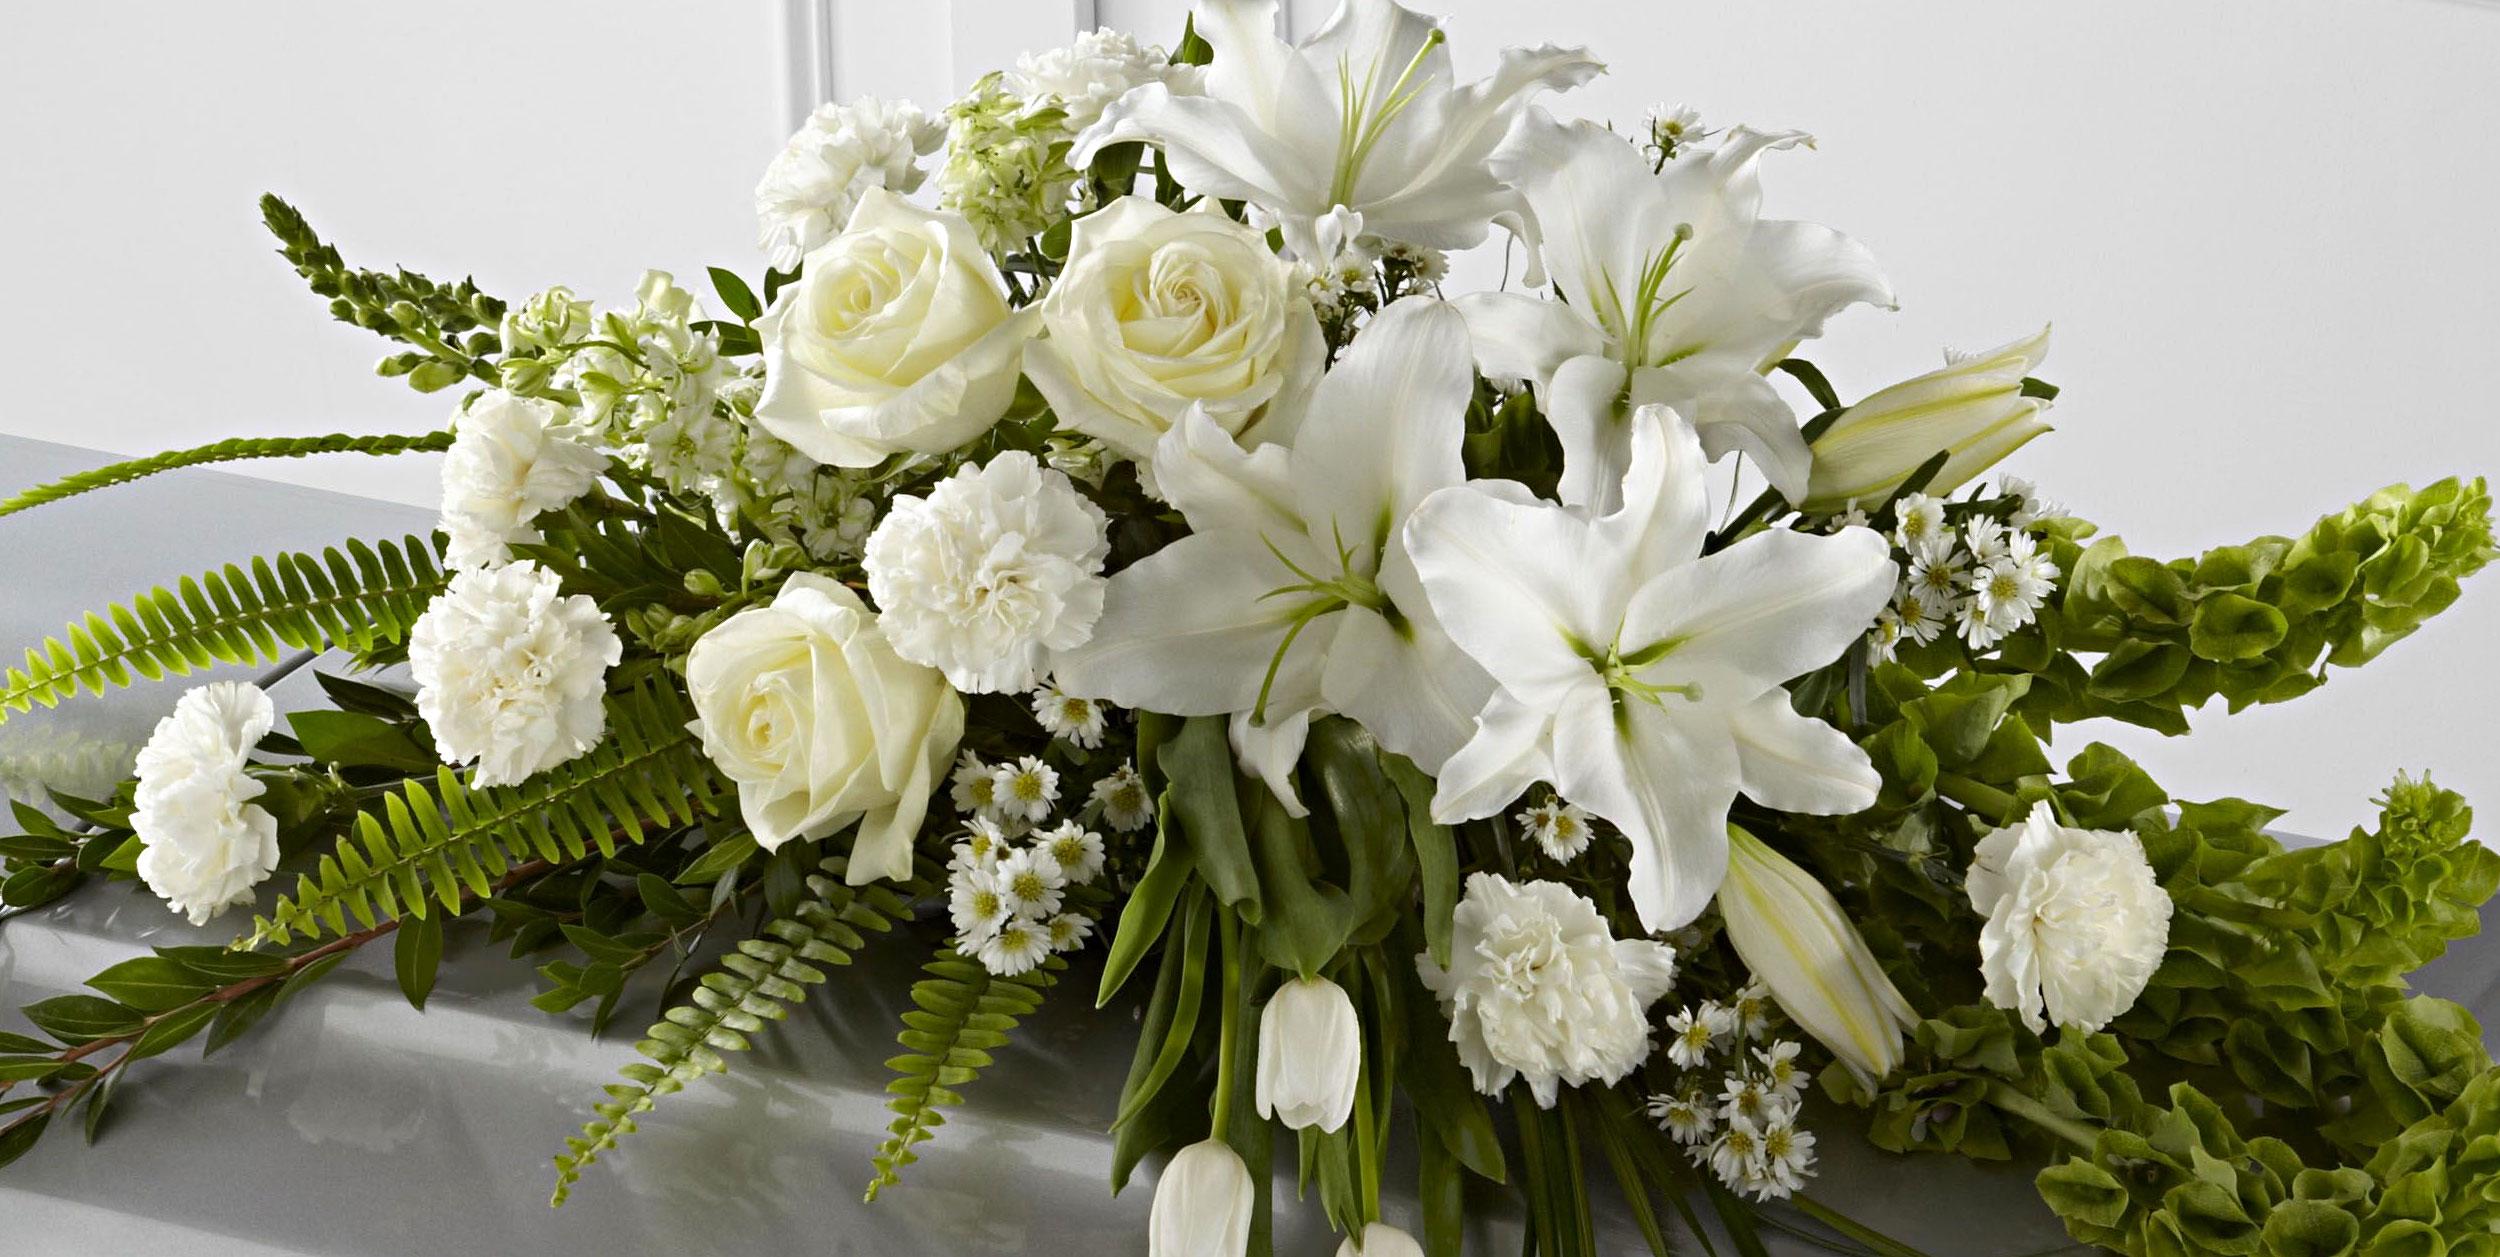 CherokeeMemorial_Banner_Flowers4.jpg